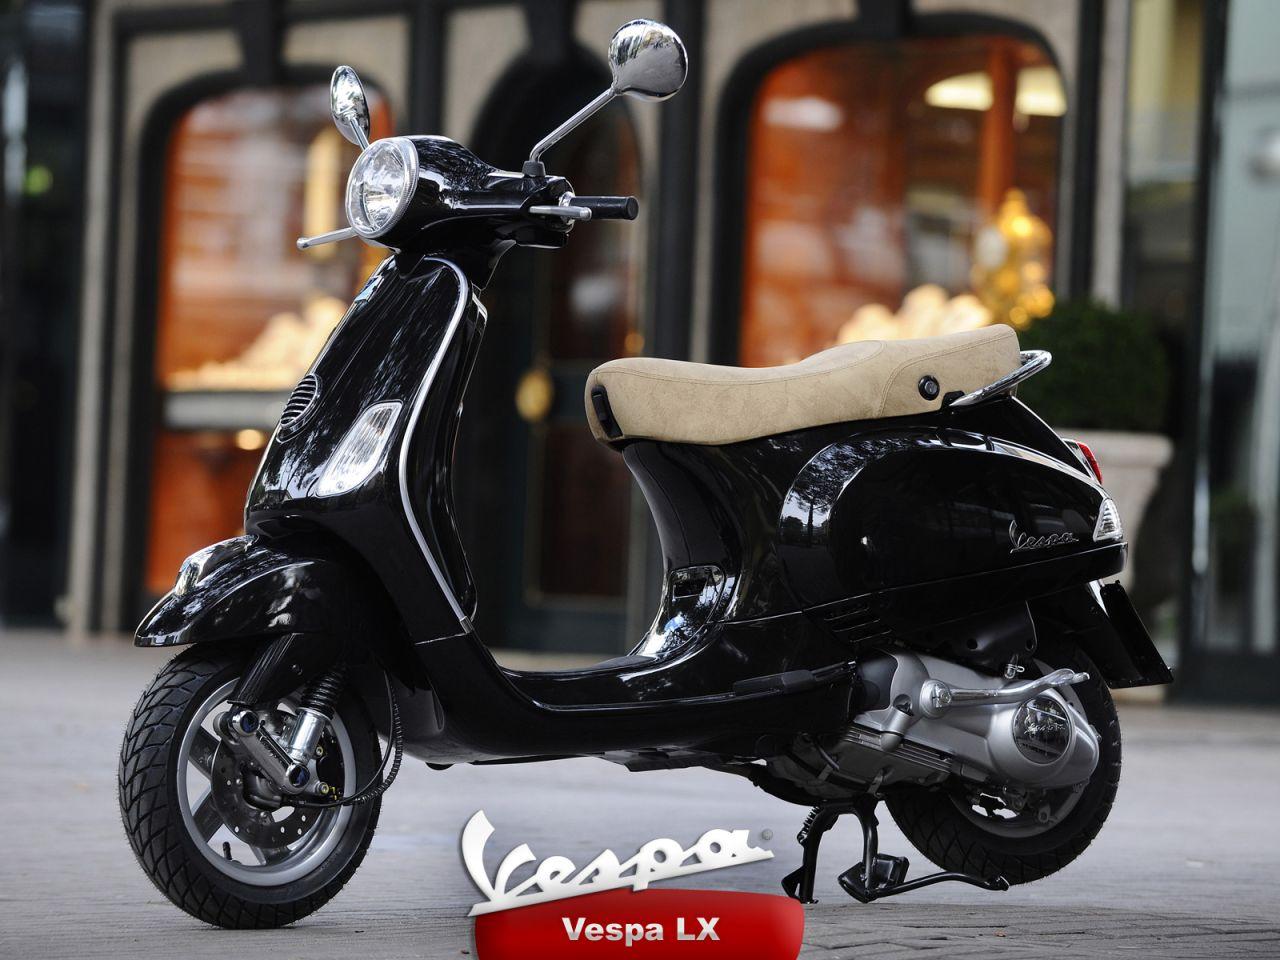 vespa lx 125 piaggio vespa motor scooter dealer resmi. Black Bedroom Furniture Sets. Home Design Ideas